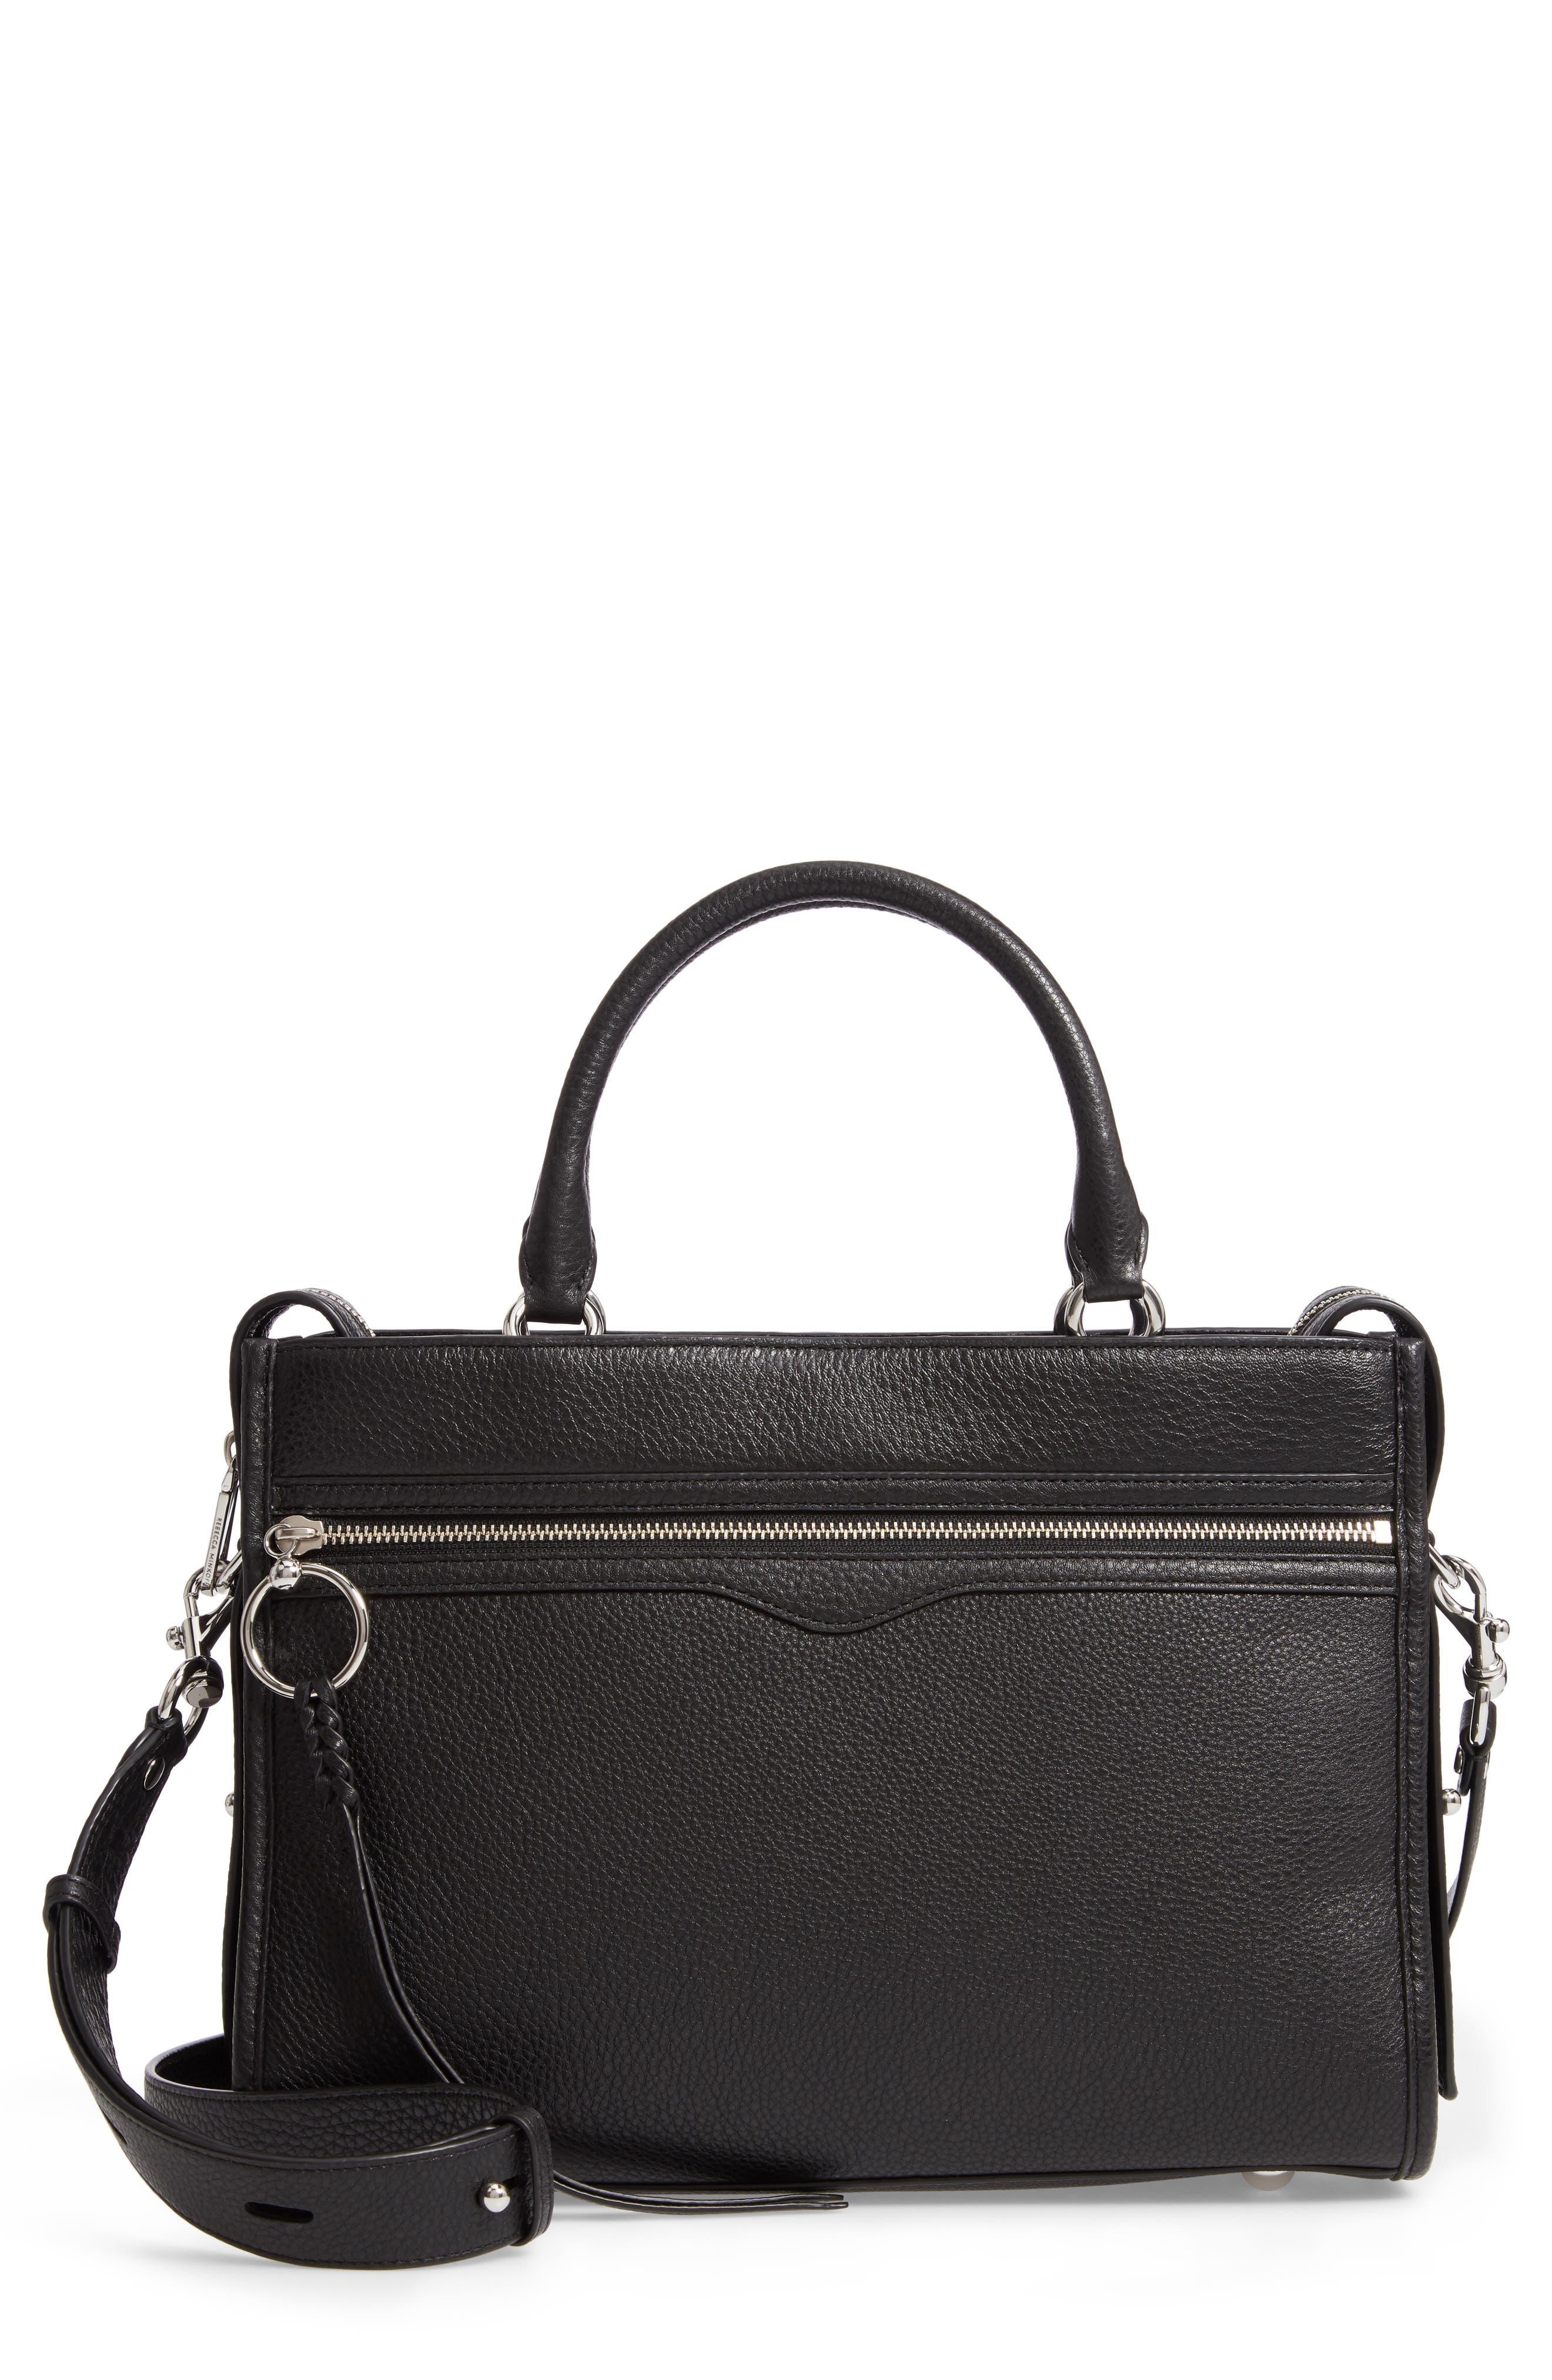 REBECCA MINKOFF Bedford Zip Leather Satchel, Main, color, BLACK